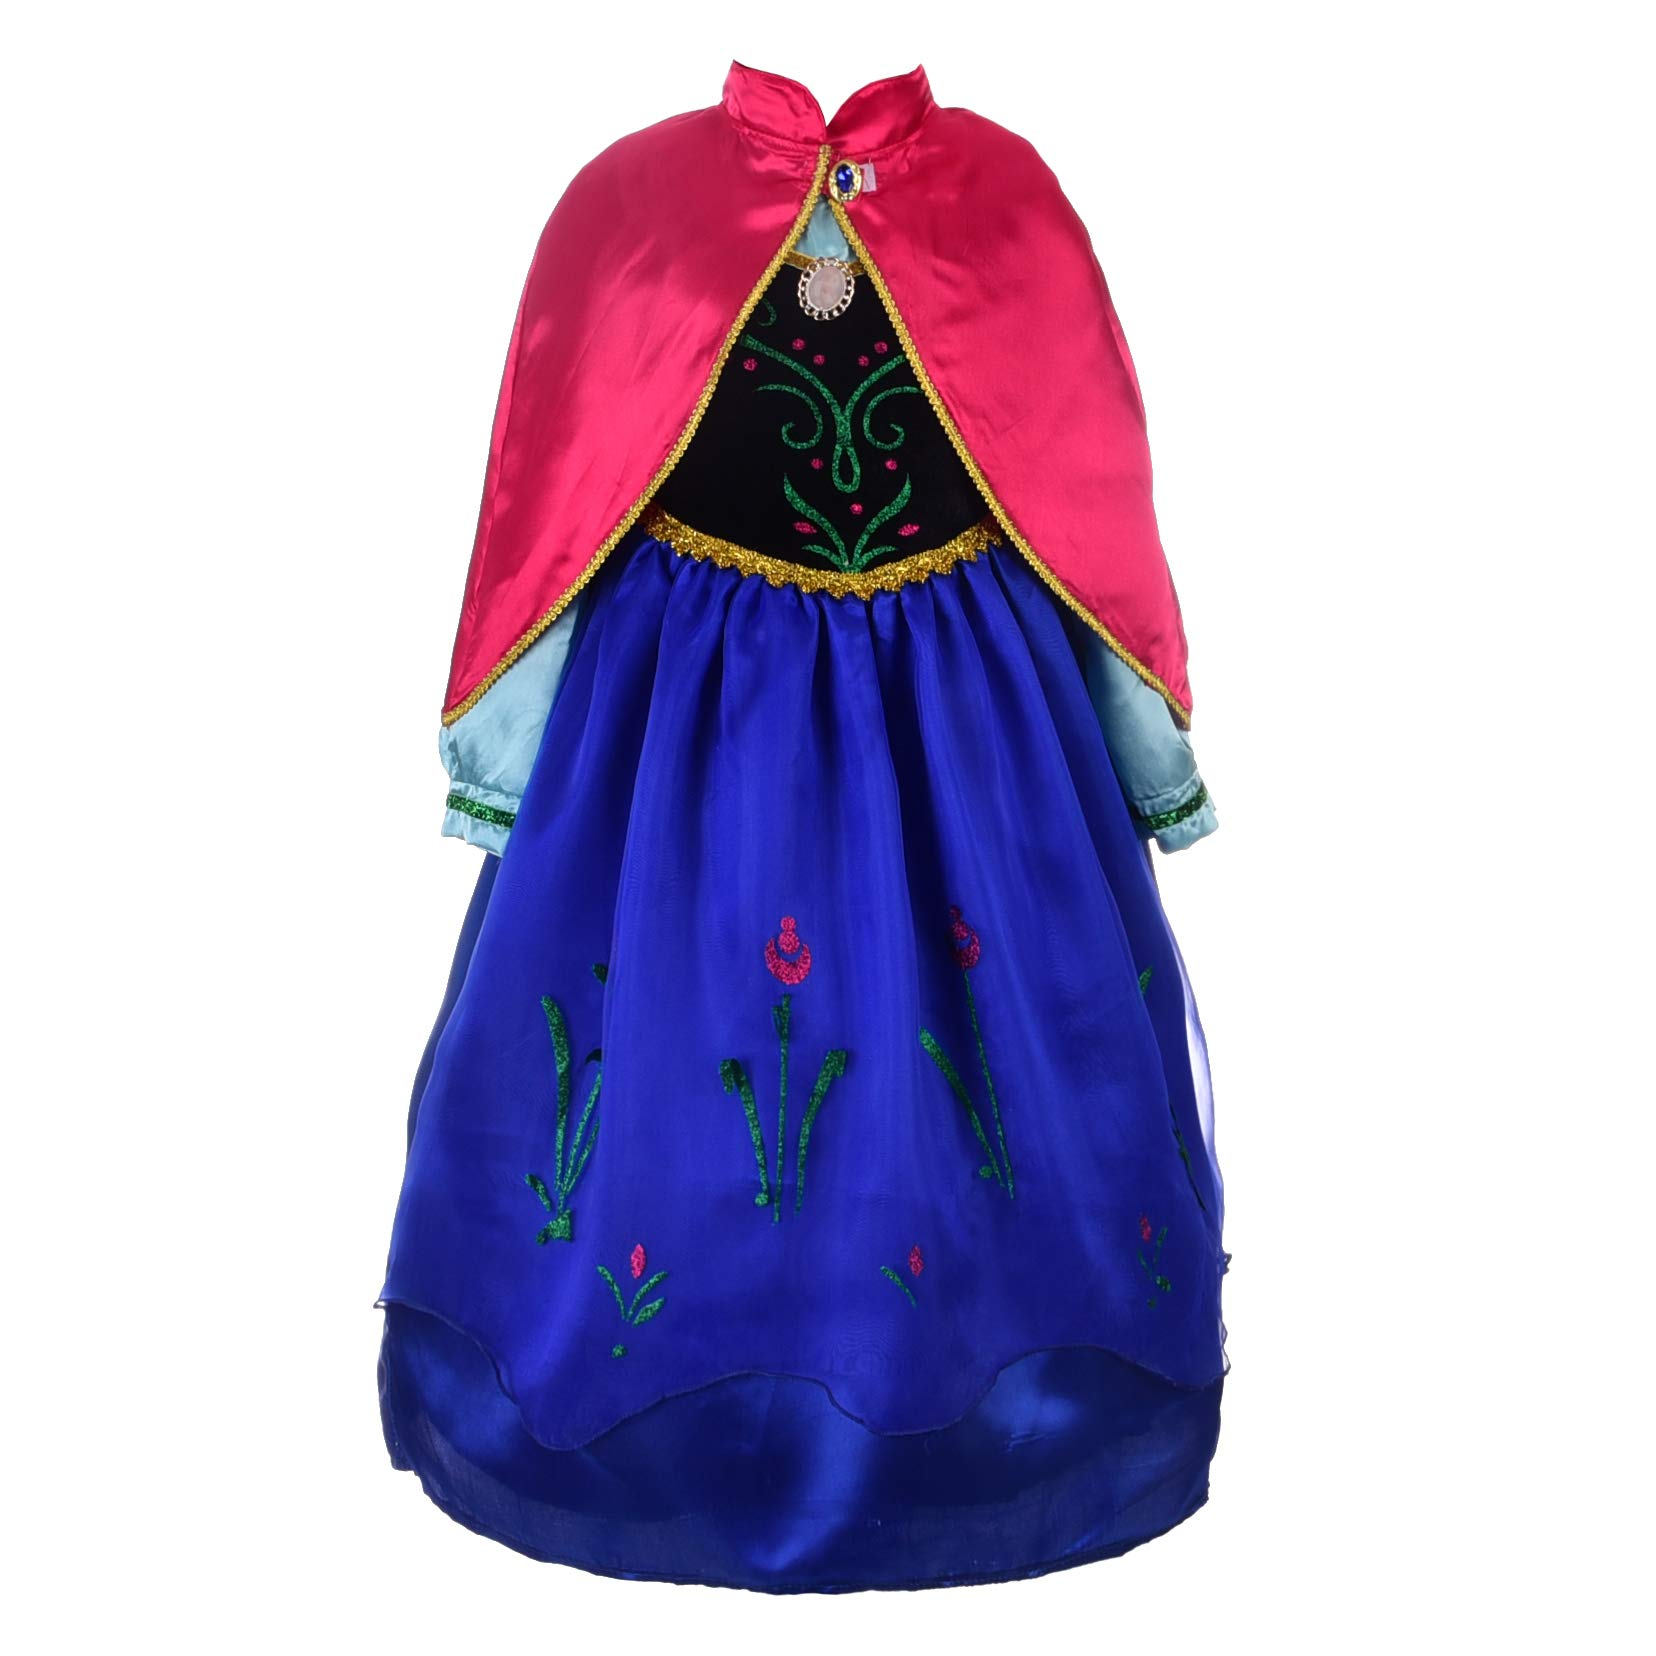 Dressy Daisy Girls Frozen Anna Coronation Gown Princess Dress Halloween Fancy Dress Costumes